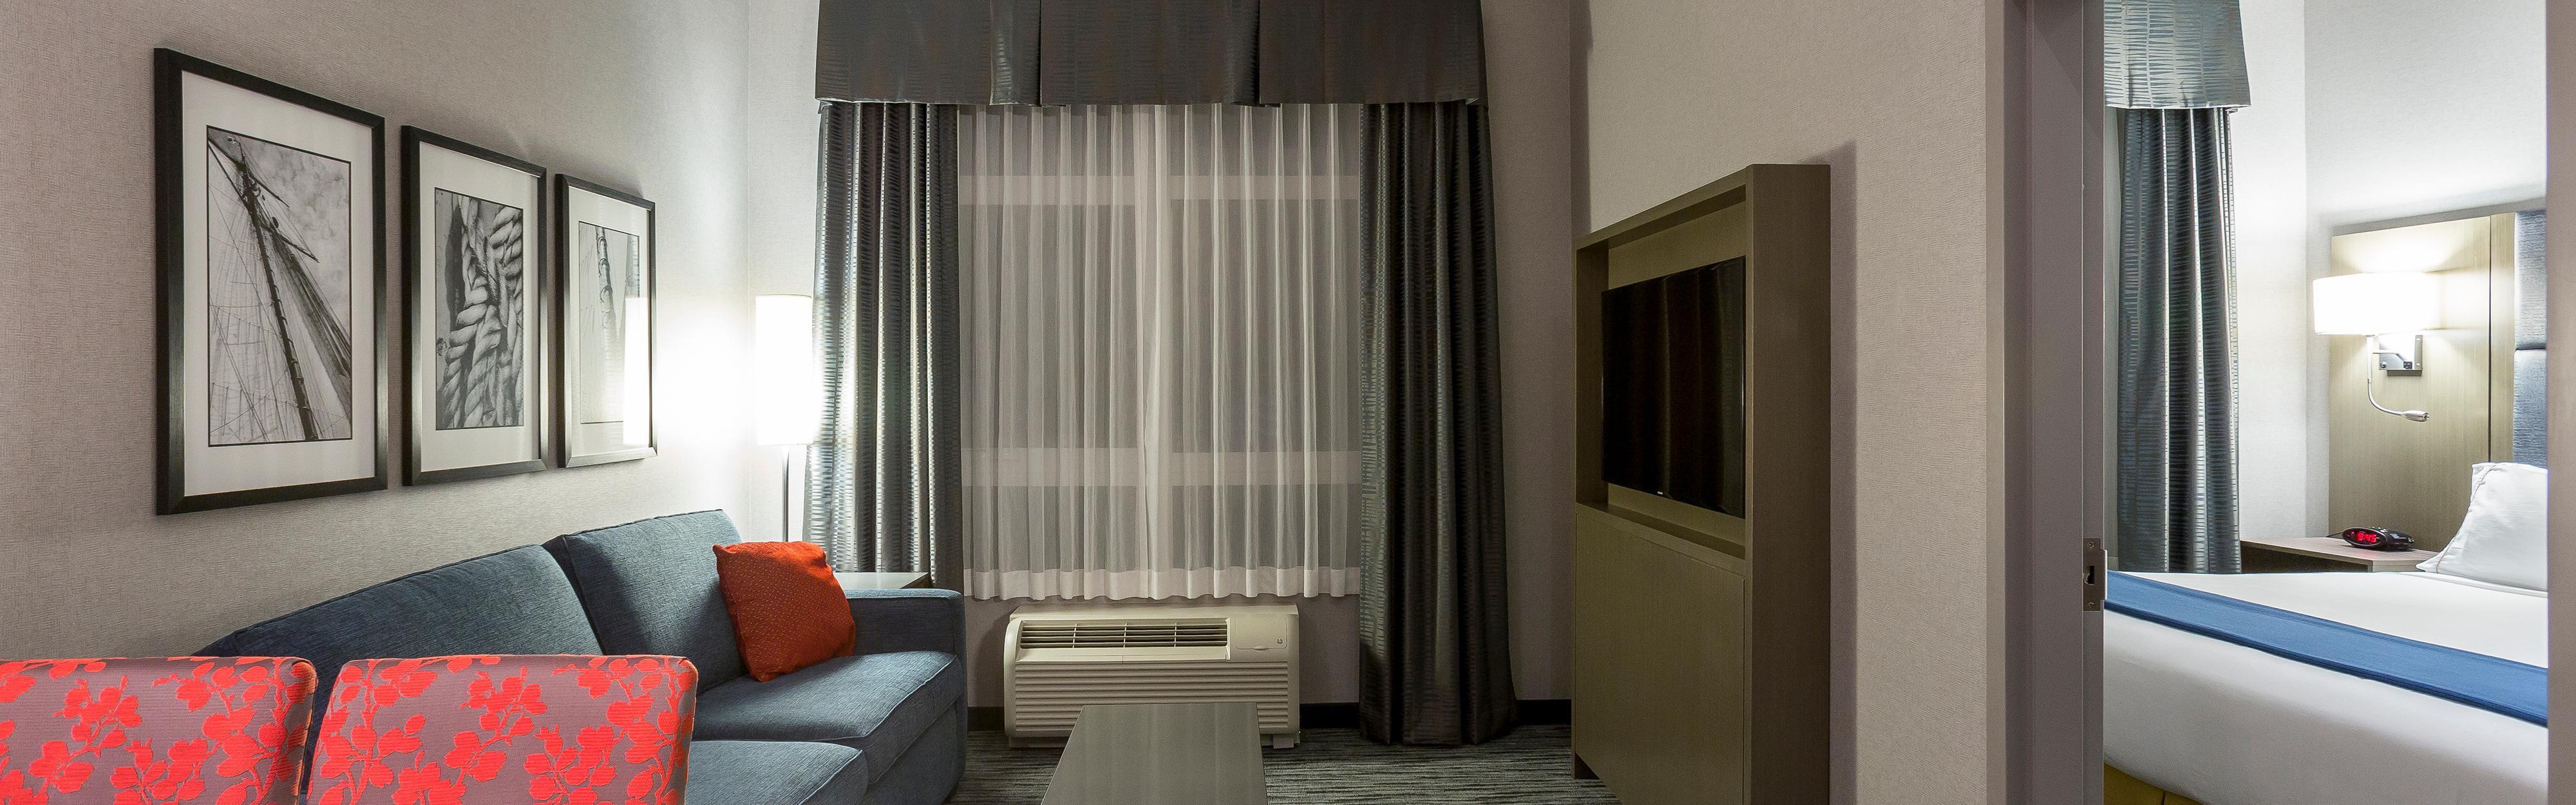 Holiday Inn Express & Suites Riverport Richmond in Richmond